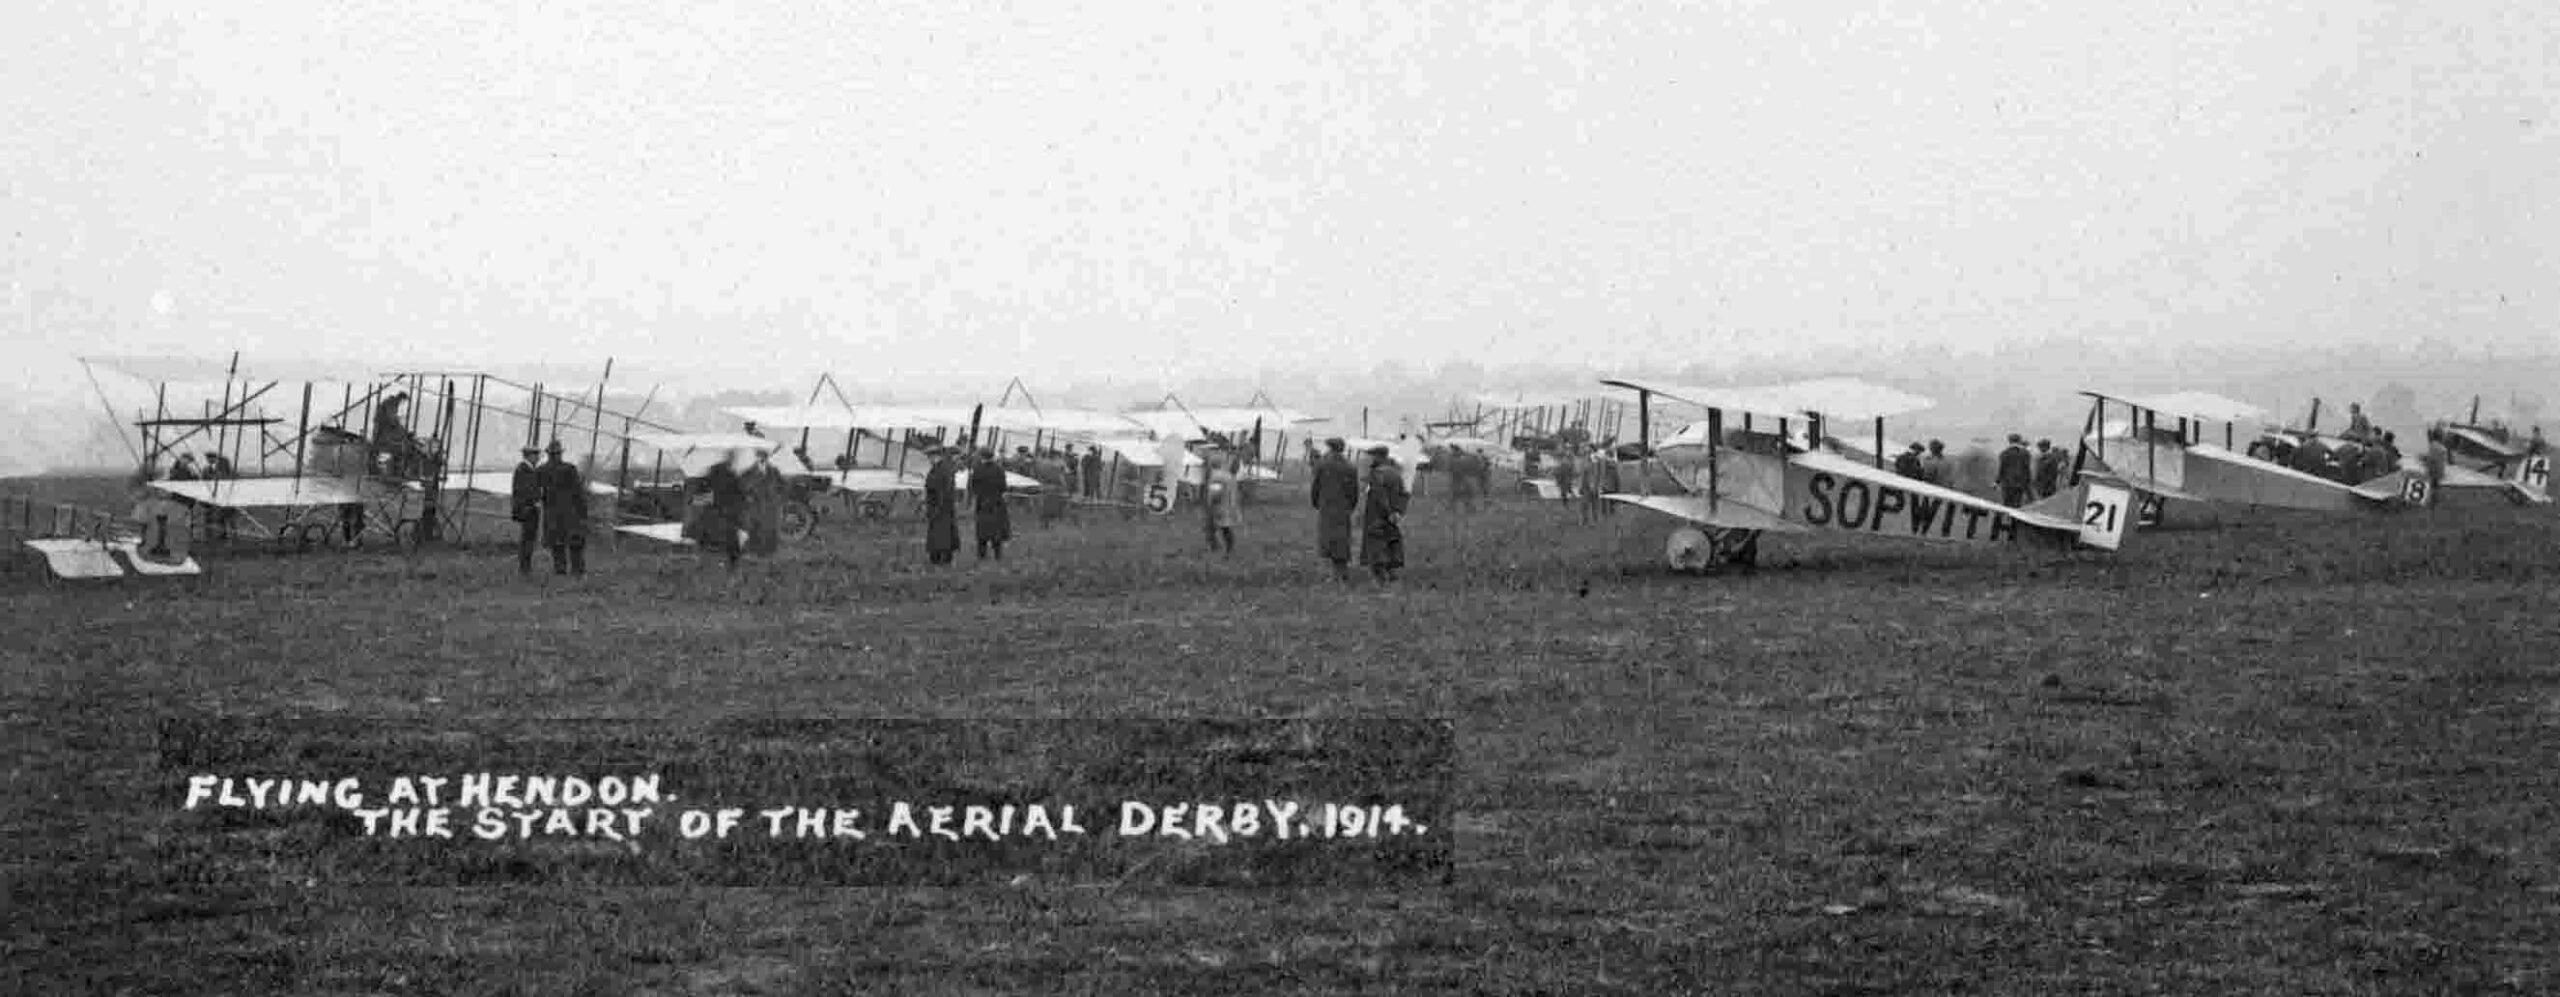 Aerial Derby 1914